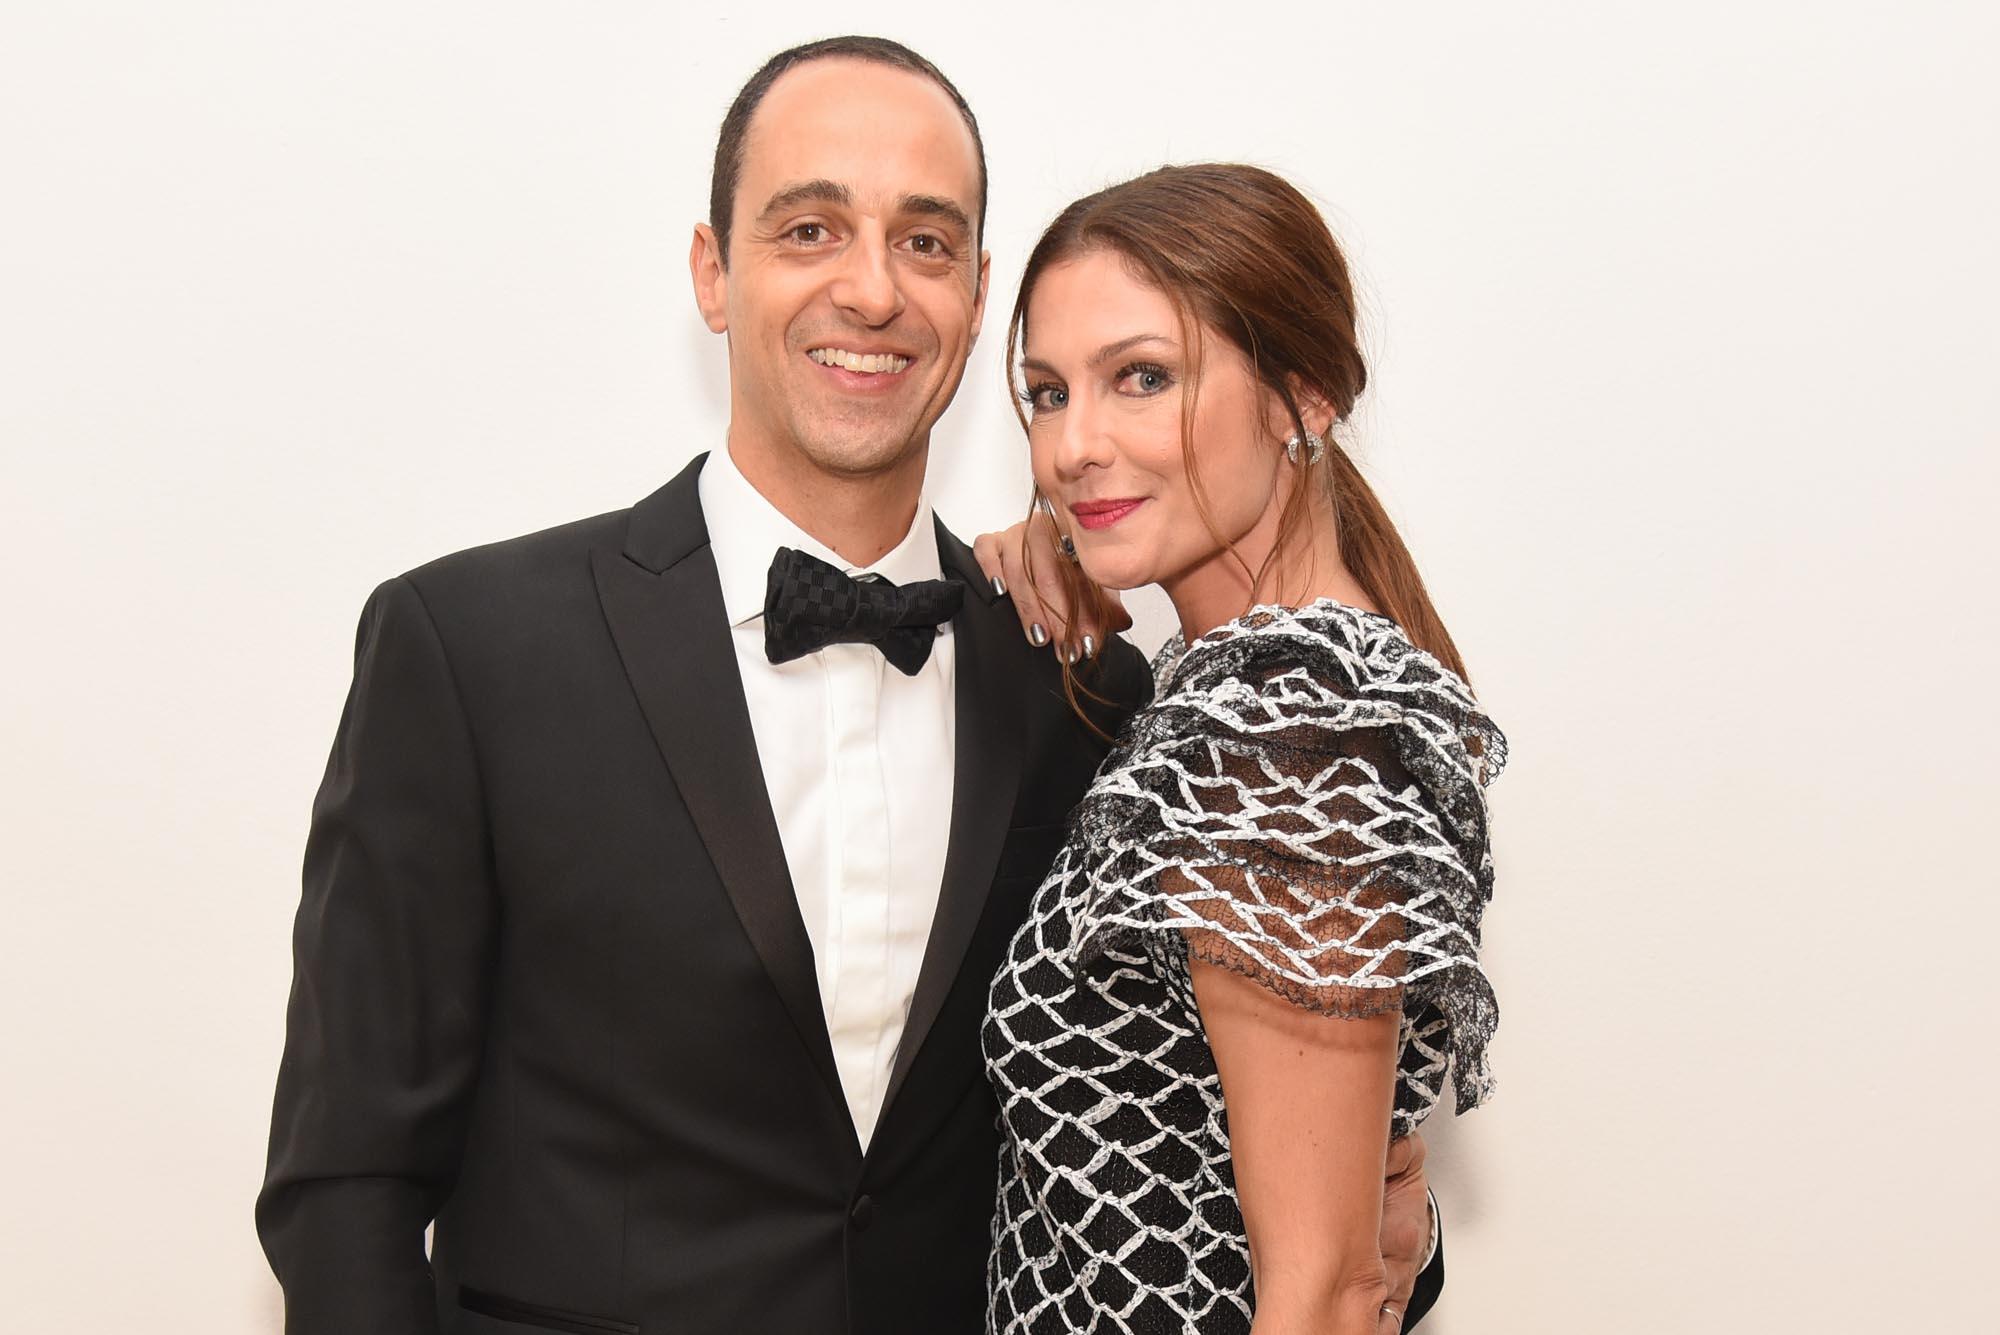 Eduardo Maluf e Camilla Guebur V BrazilFoundation Gala São Paulo Chanel 2018 Filantropia Brasil Philanthropy Brazil